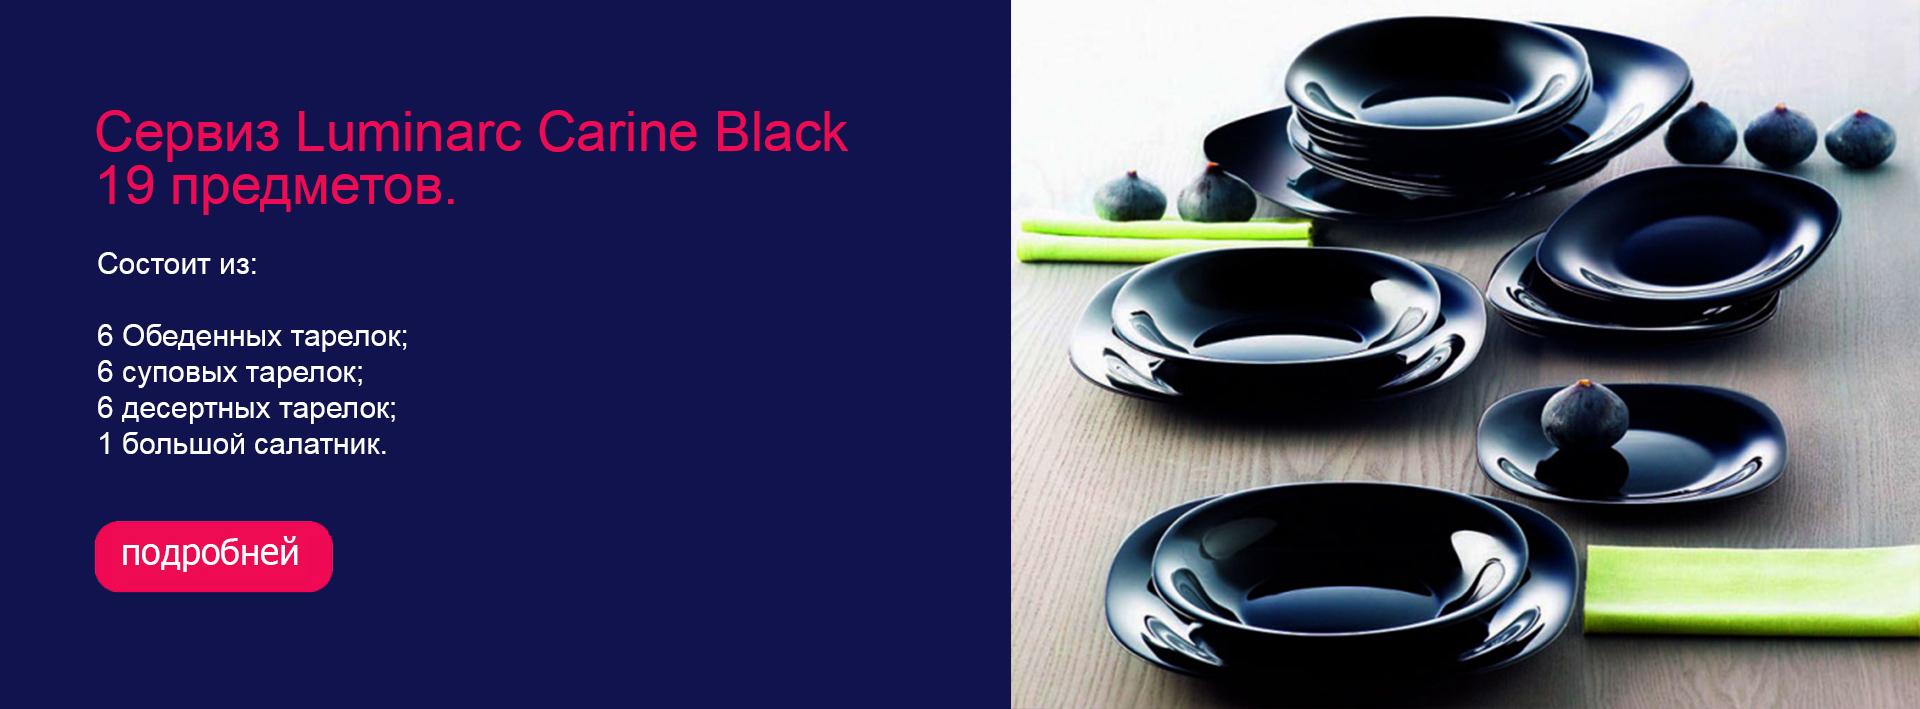 Luminarc Carine Black